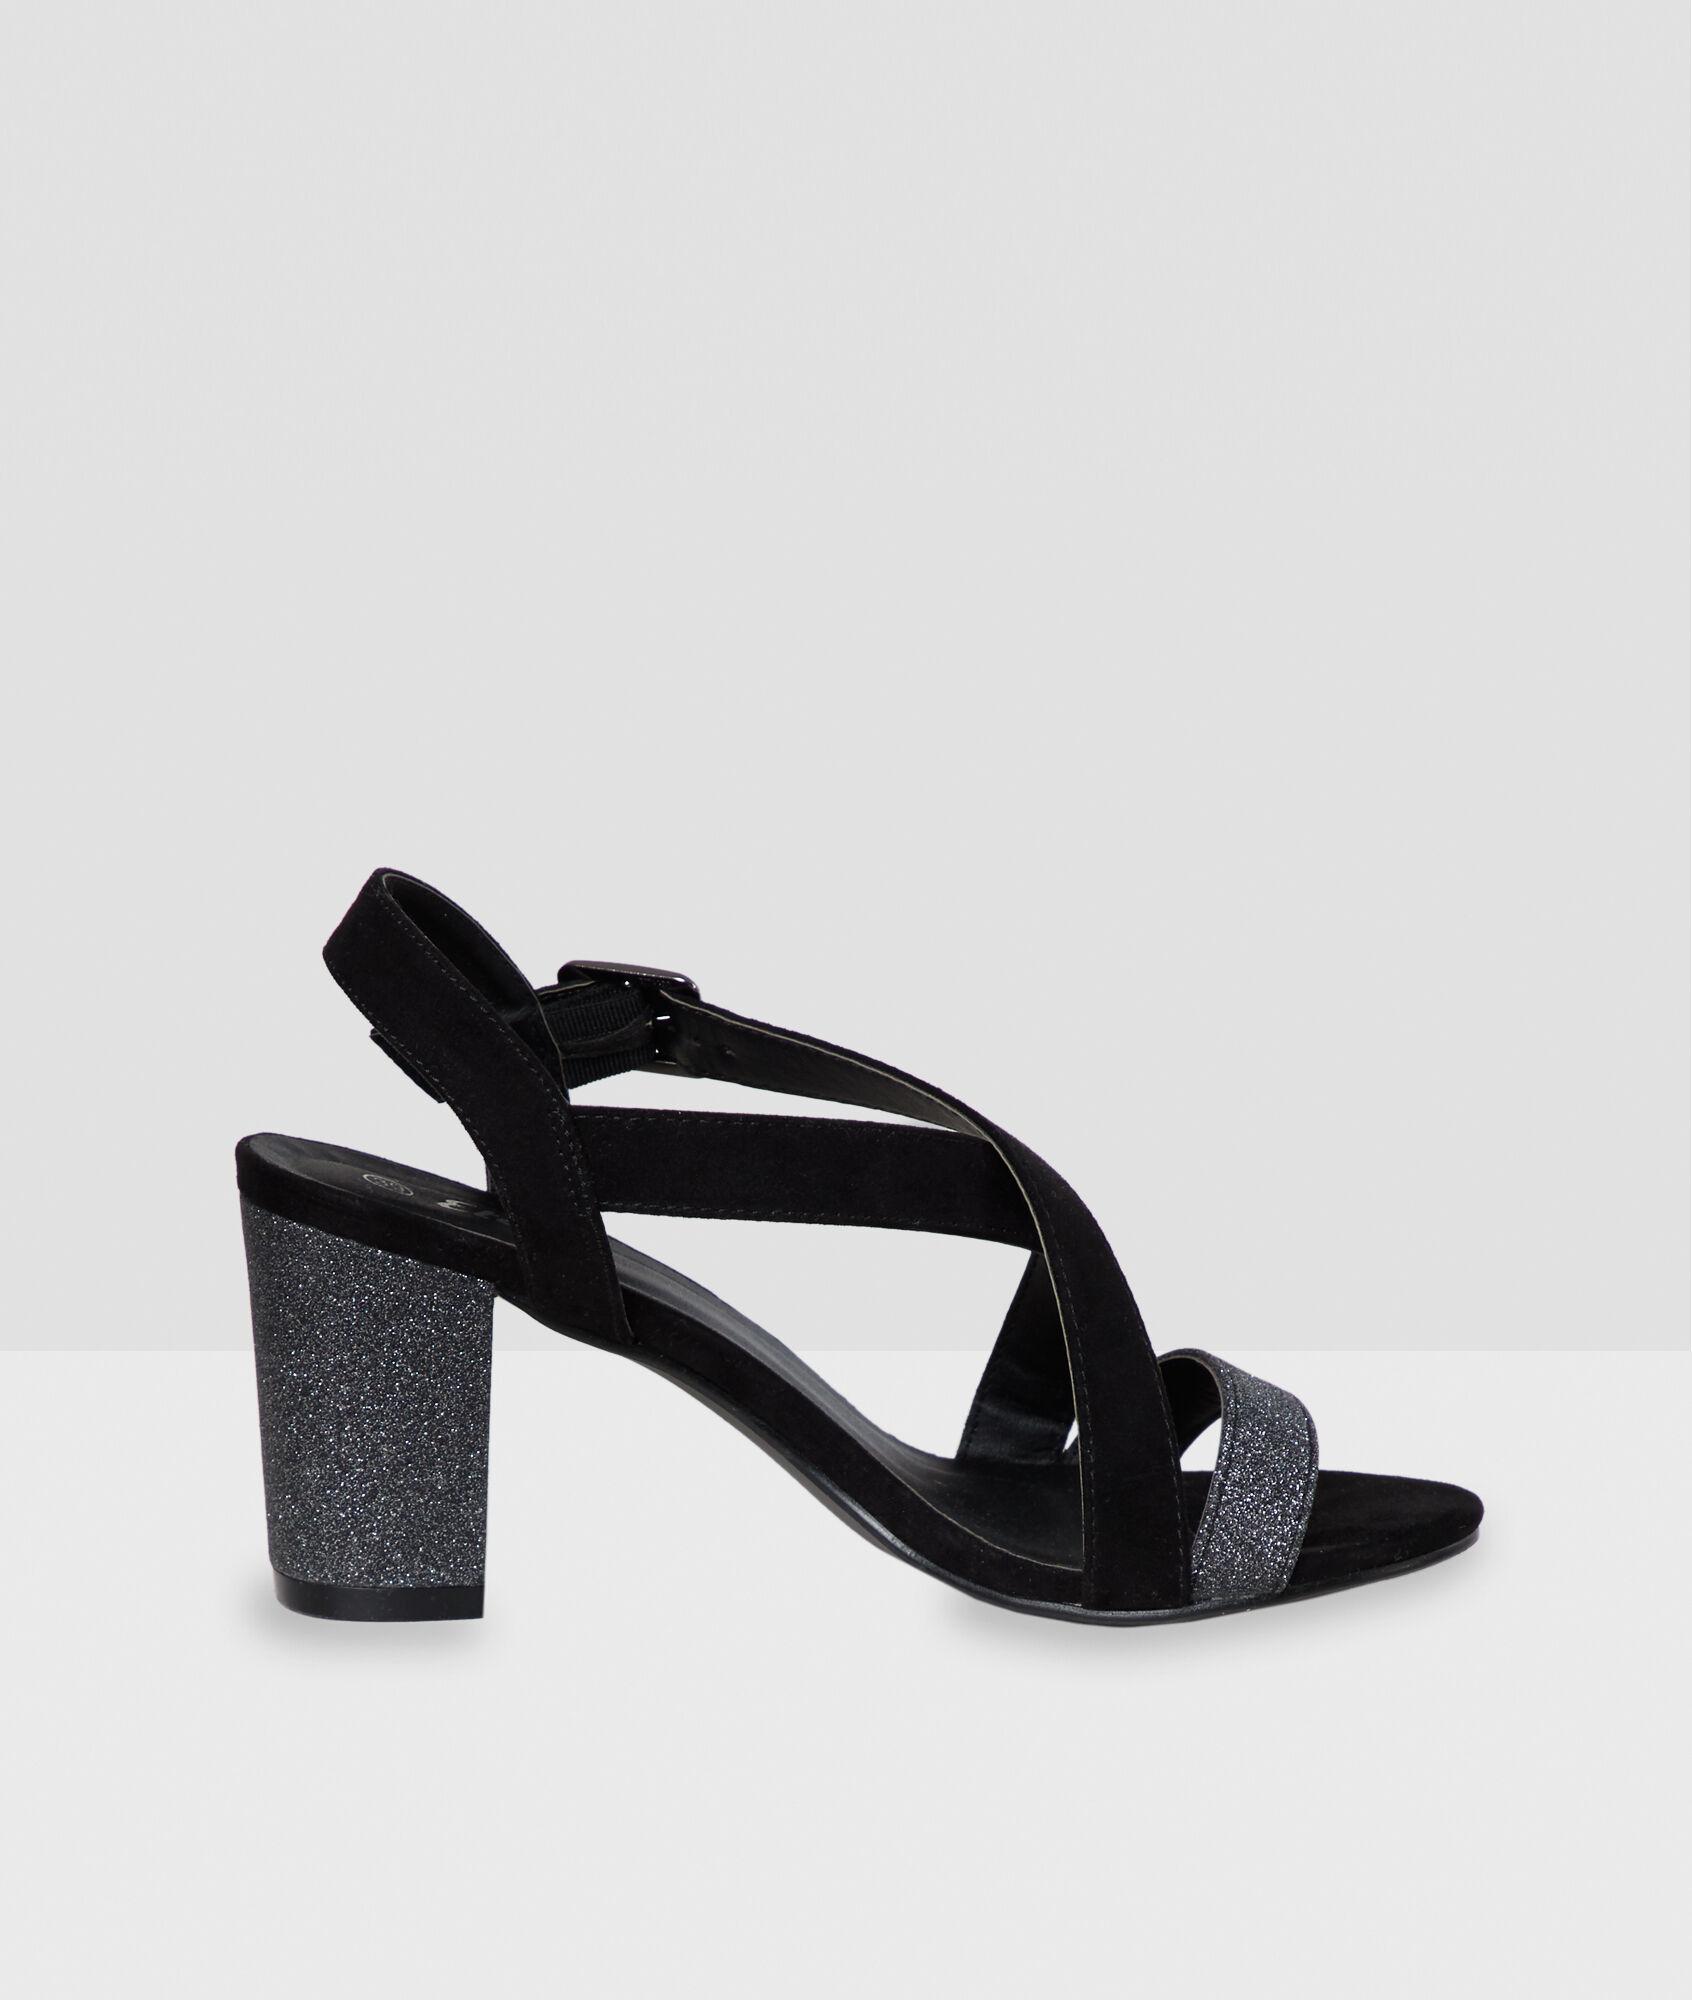 Chaussures - Sandales Post Orteils Grnland xhKww